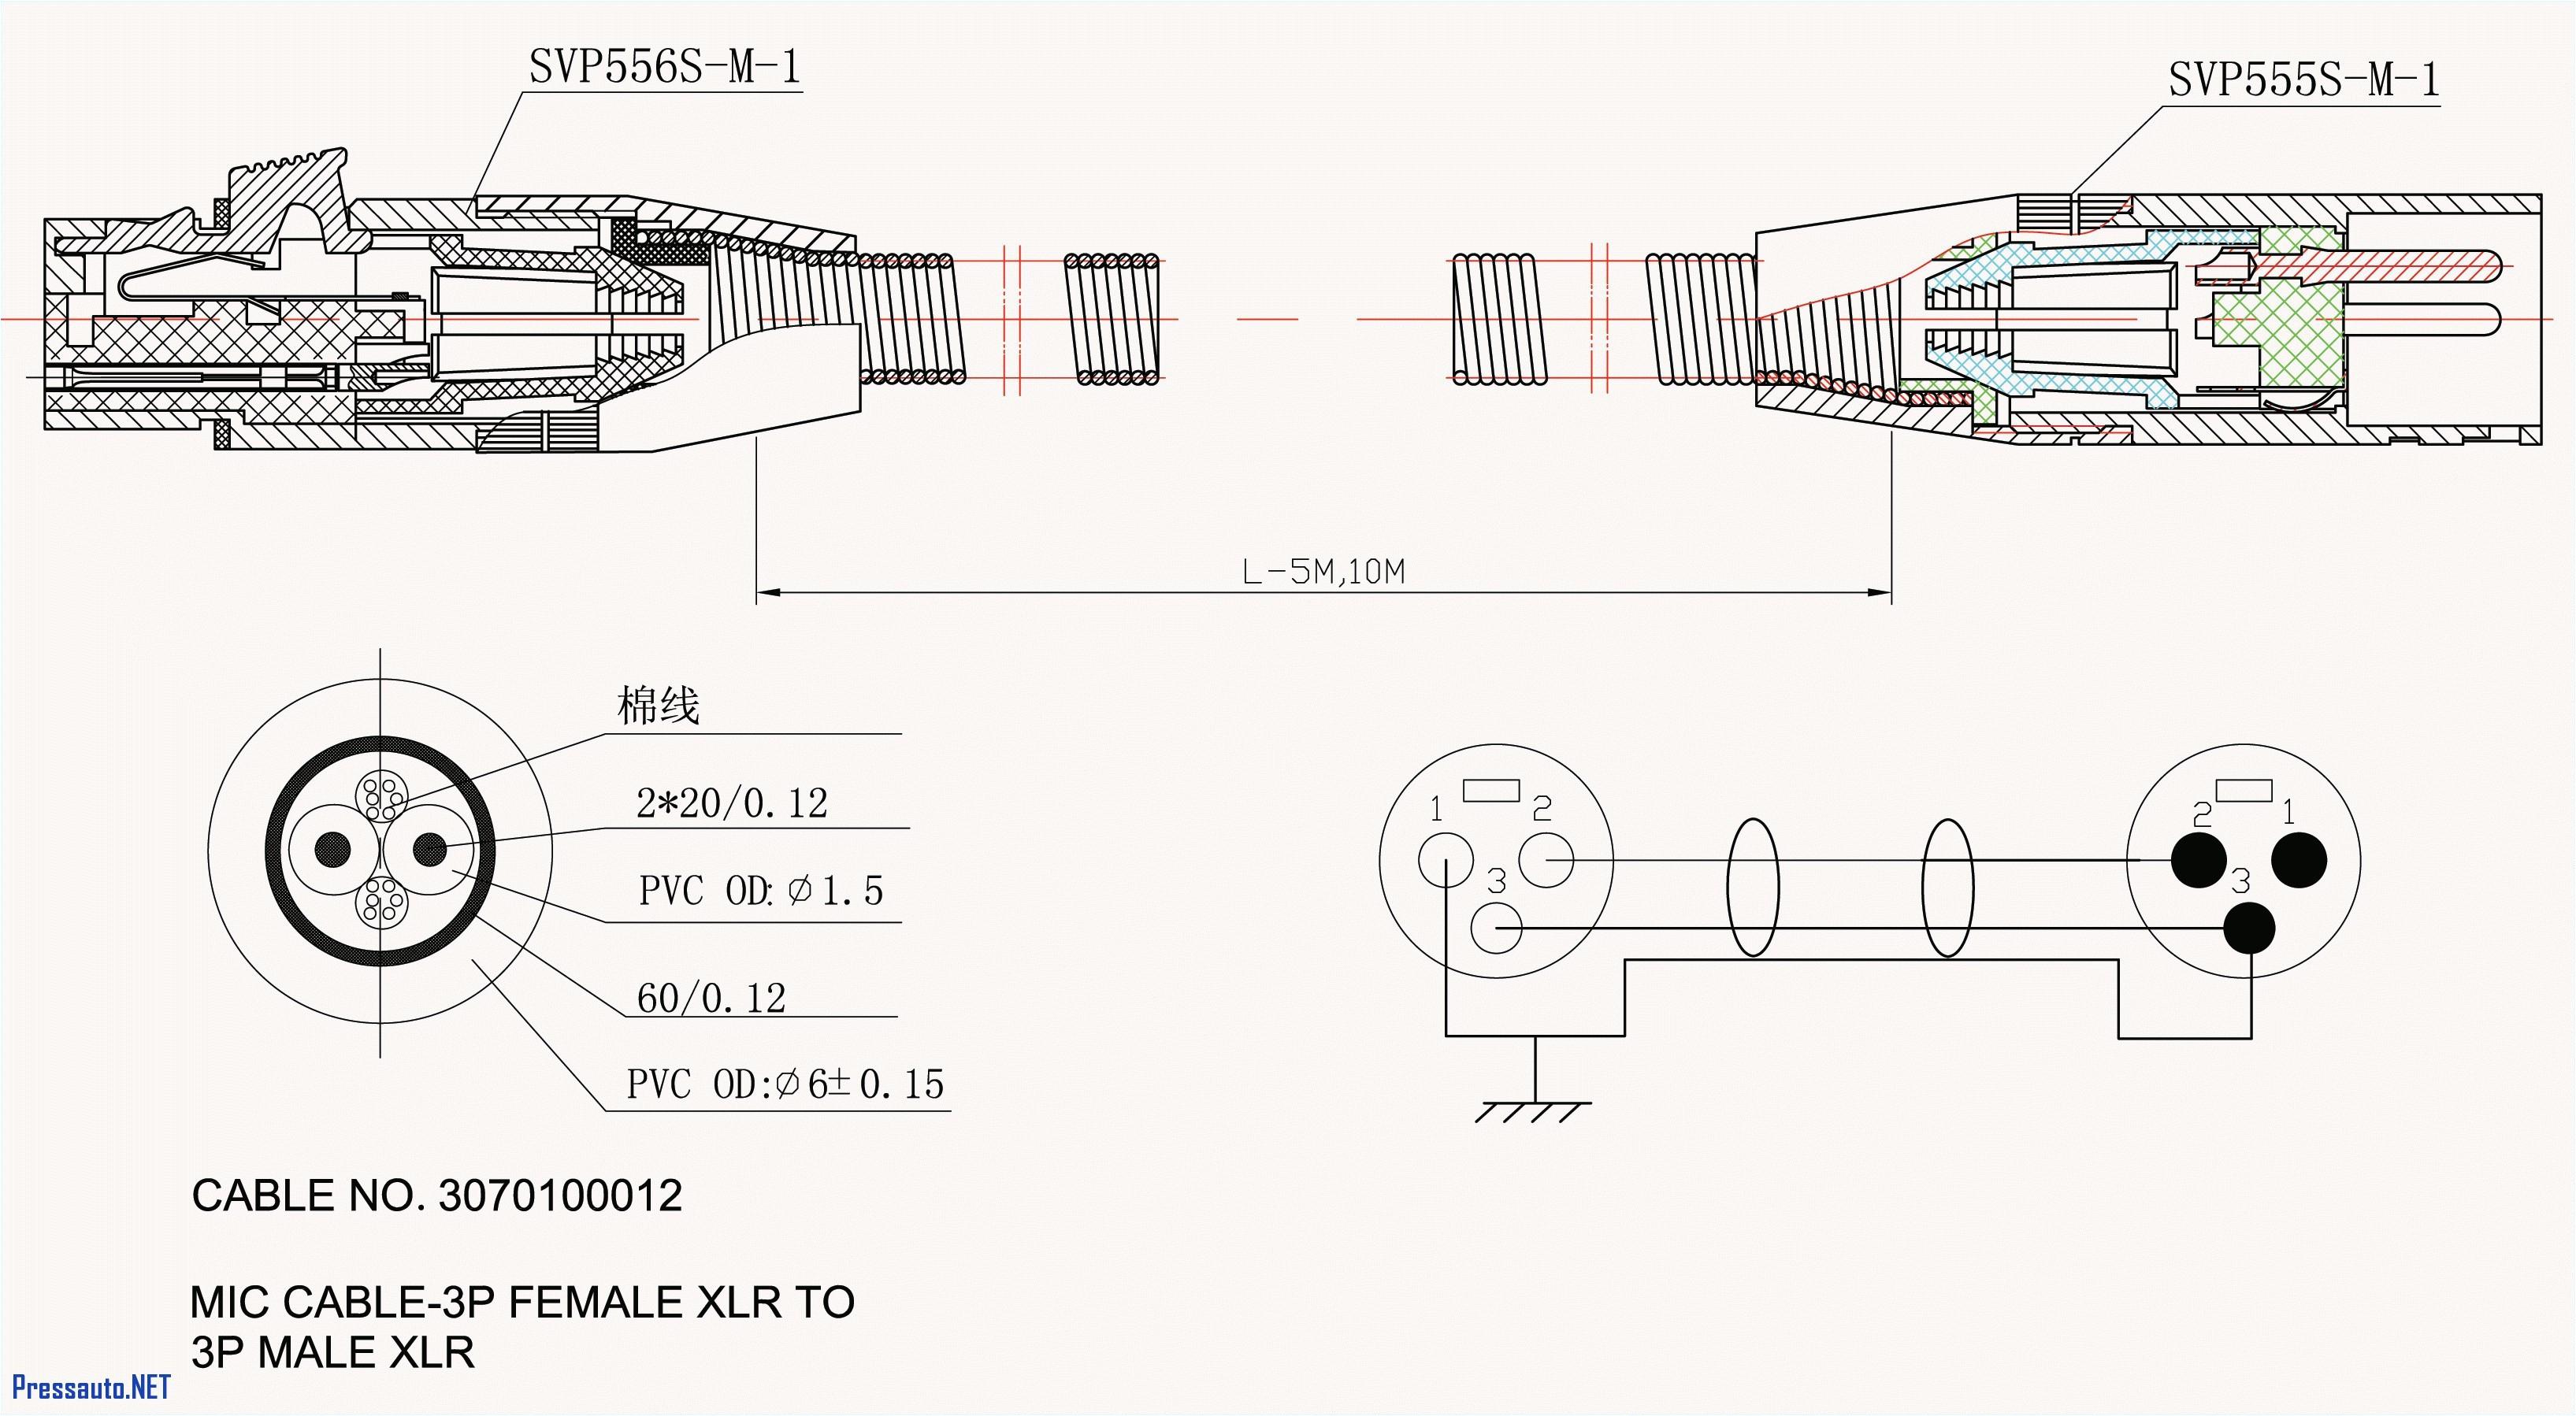 0 5 mustang tach wiring data wiring diagram 0 5 mustang tach wiring